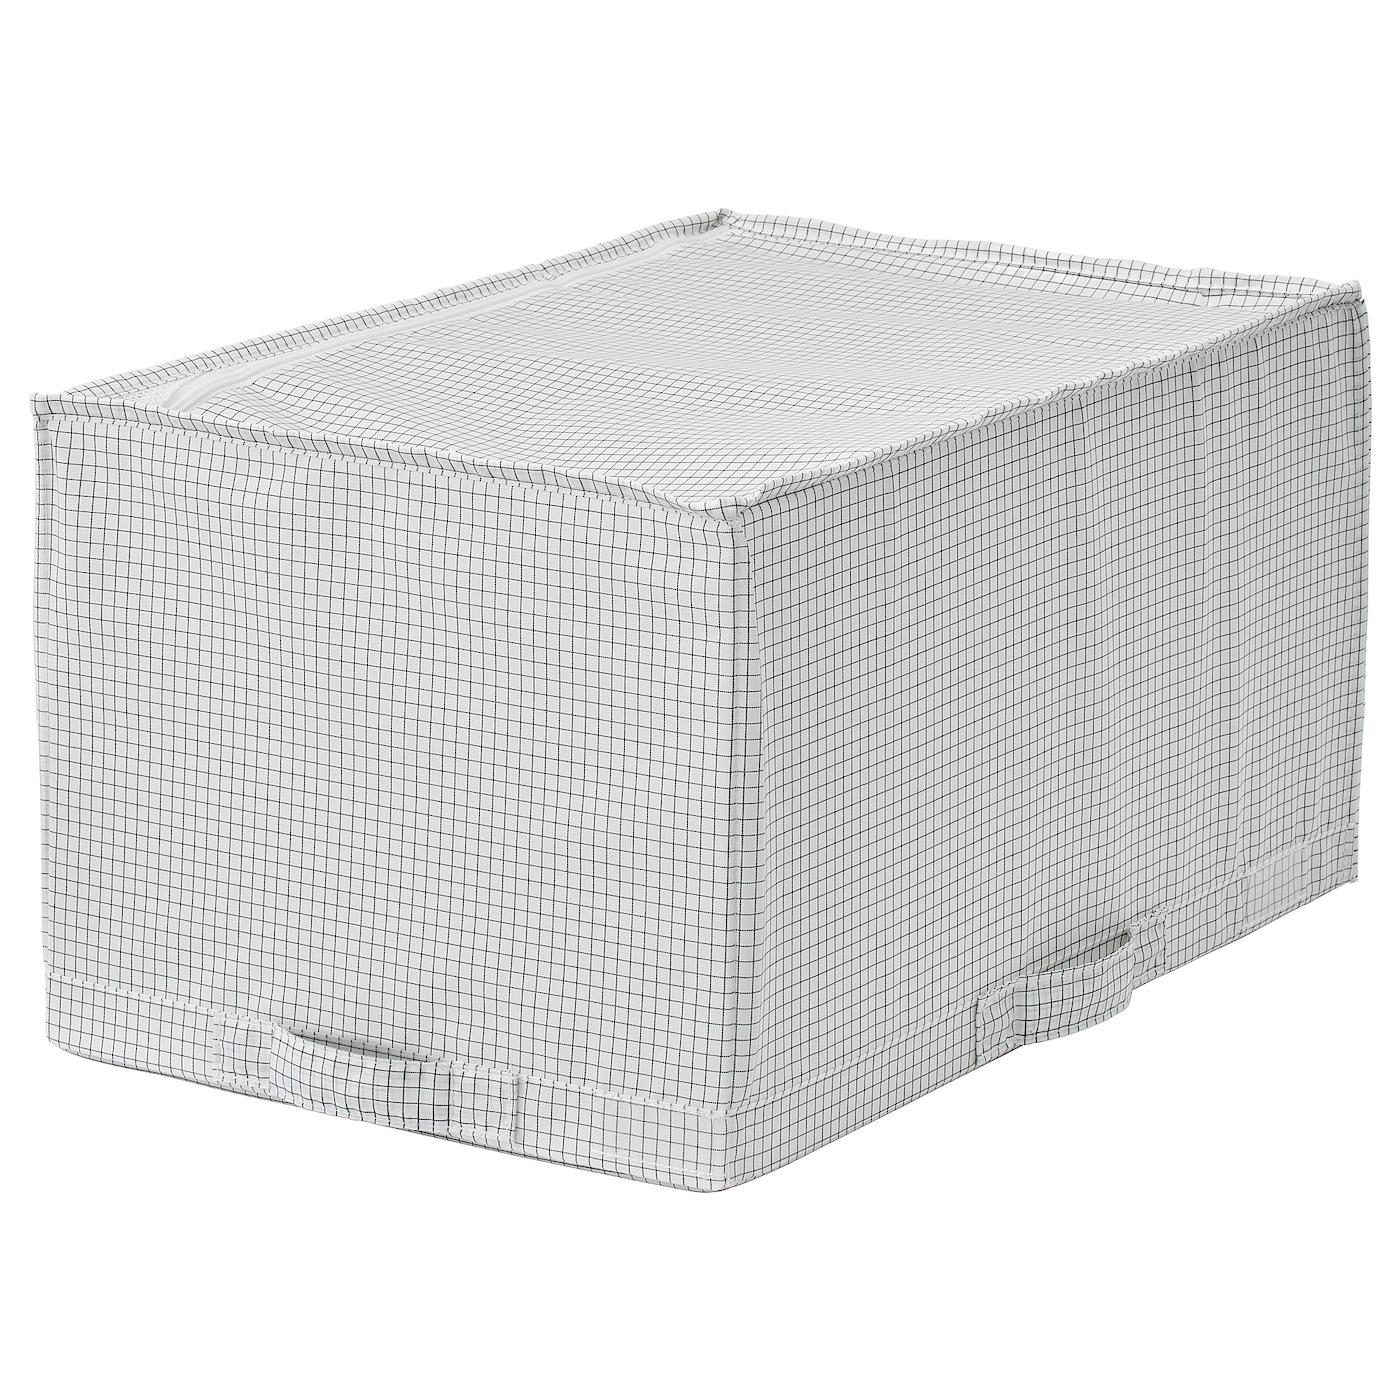 IKEA STUK Tasche - 51 x 34 x 28 cm